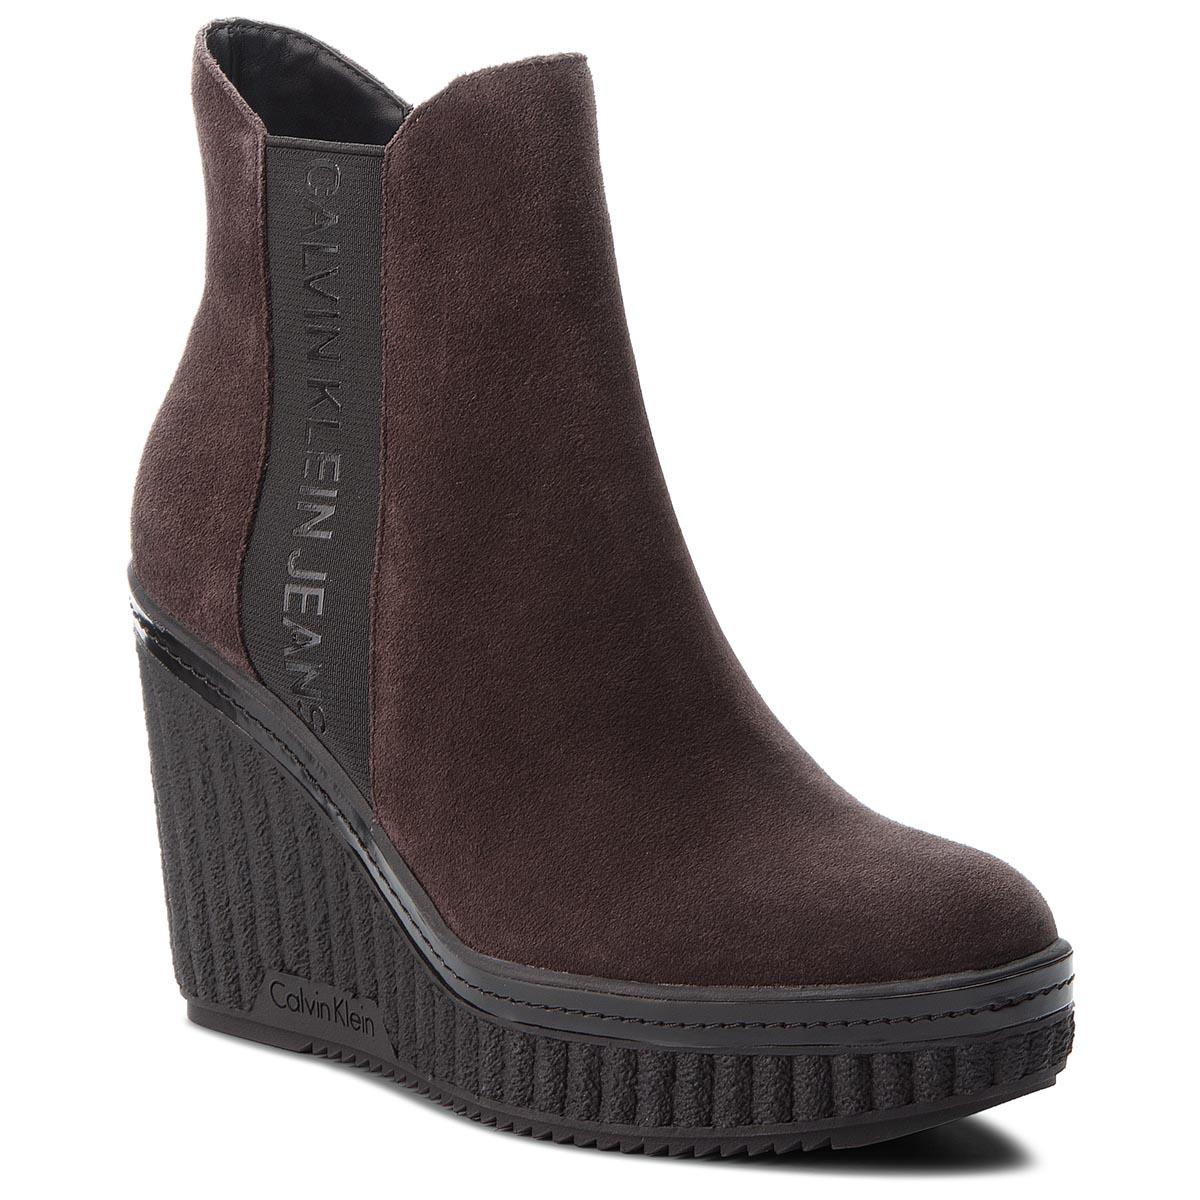 Magasított cipő CALVIN KLEIN JEANS - Shanna RE9765 Dark Brown - Glami.hu 60aa76c9cd